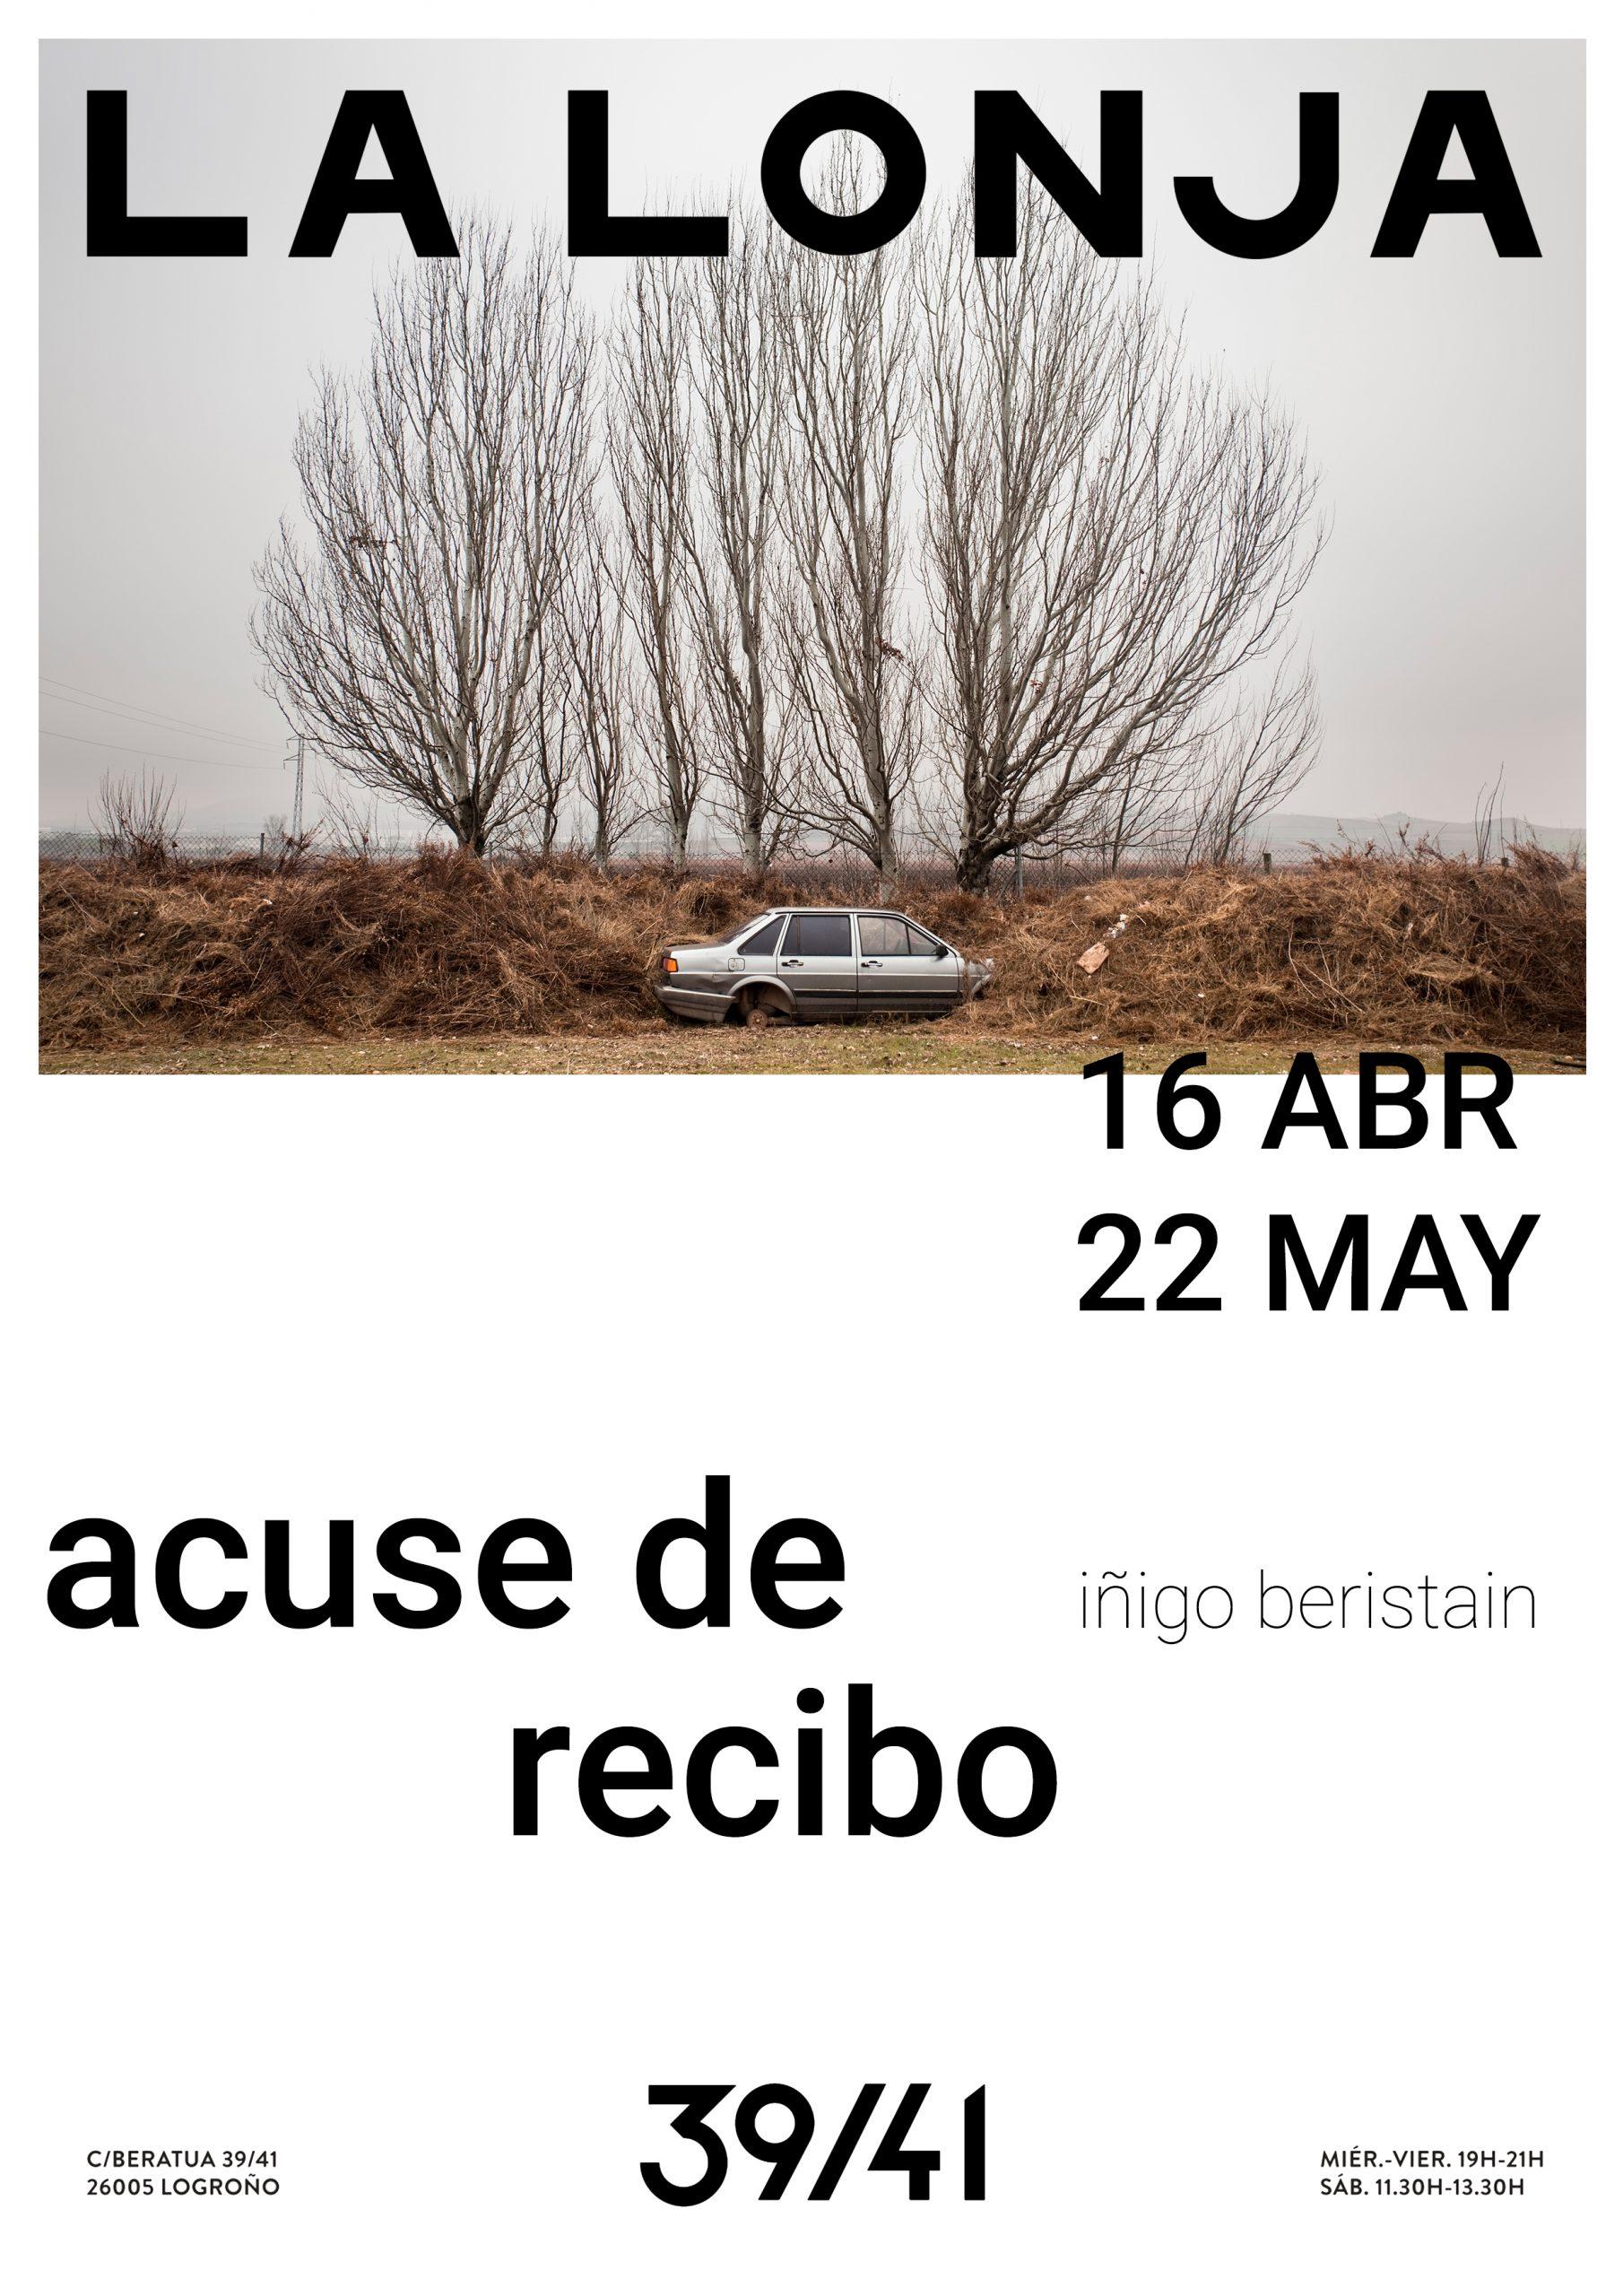 ACUSE DE RECIBO / IÑIGO BERISTAIN. 16.ABR.- 22.MAY.2021